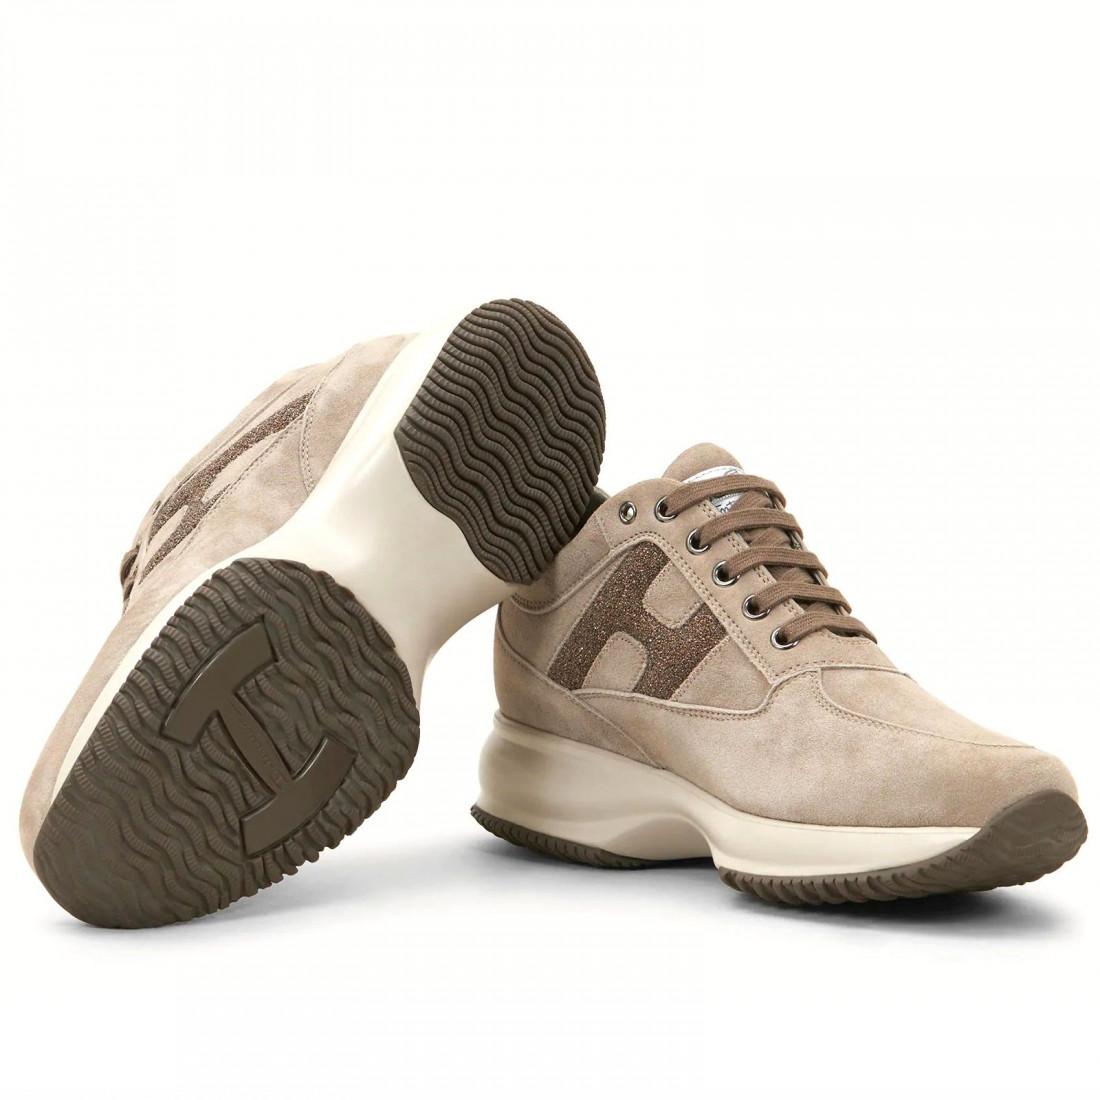 sneakers donna hogan hxw00n0s360o6uc407 7576